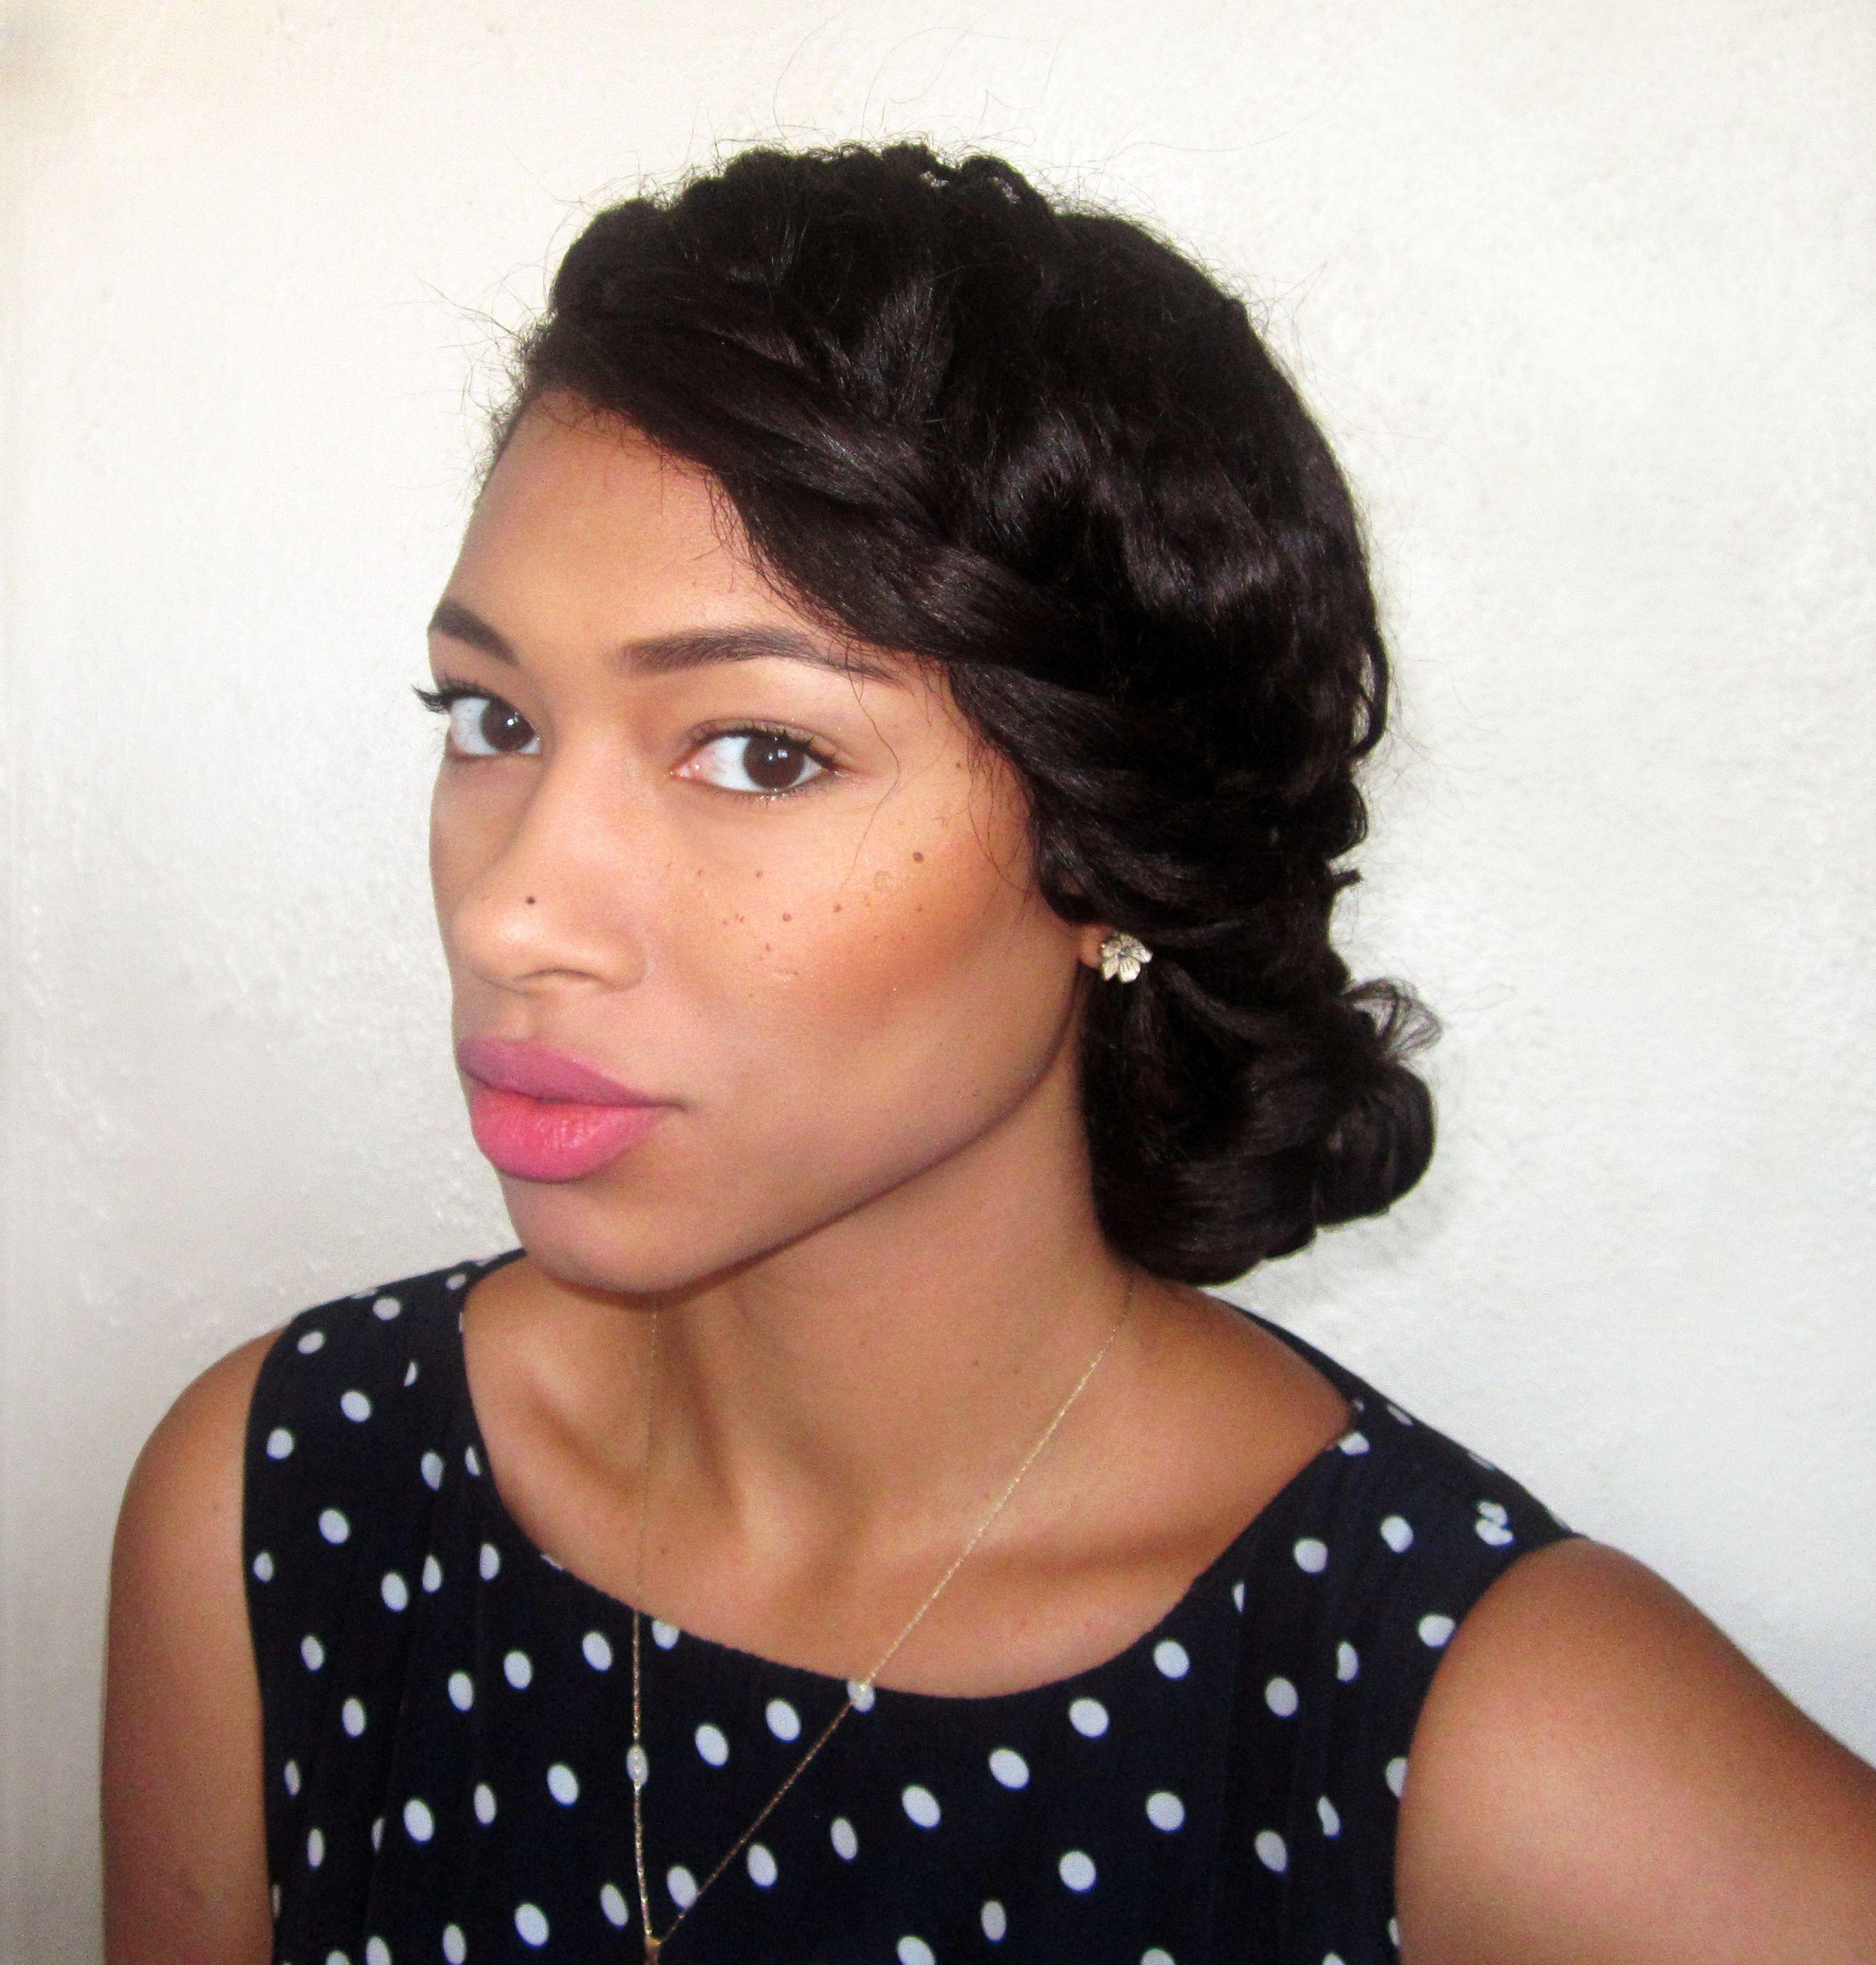 Wondrous 1000 Images About Hair On Pinterest Short Hairstyles For Black Women Fulllsitofus